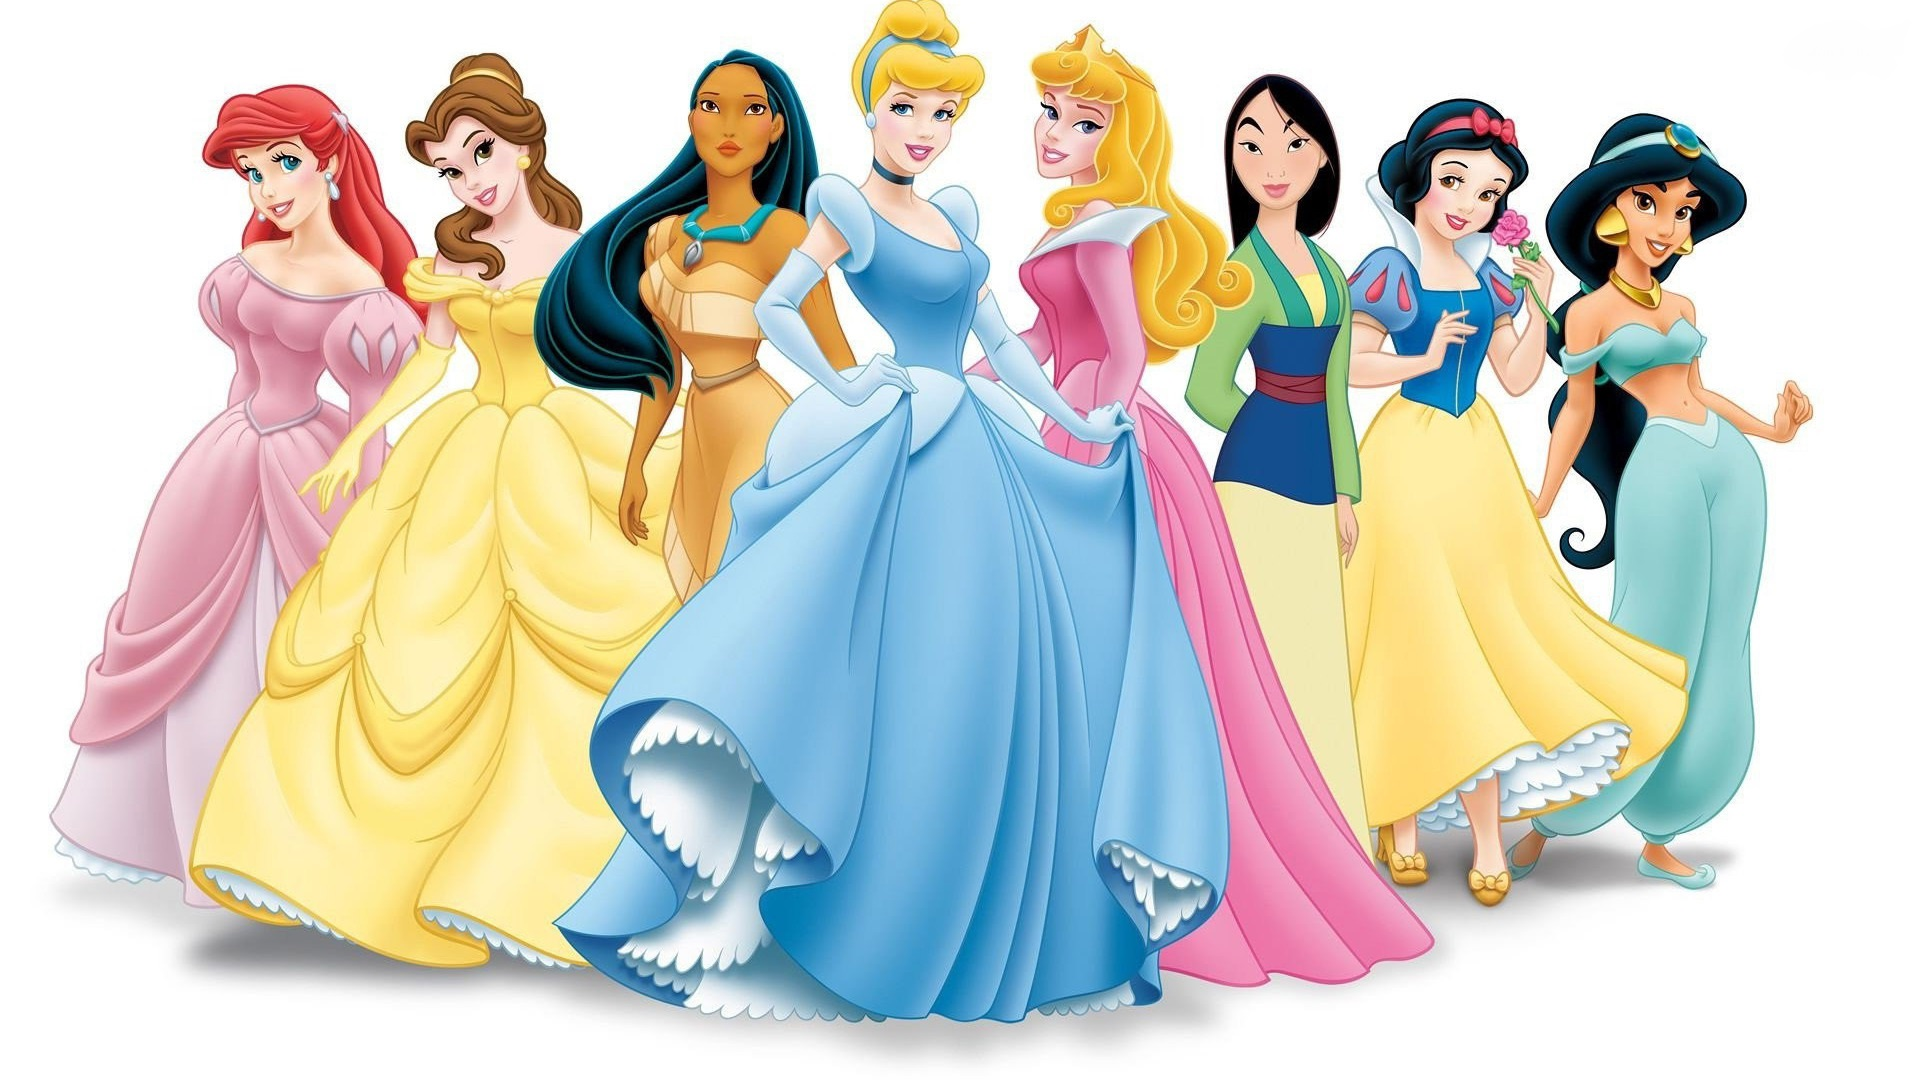 immagini di principesse vere